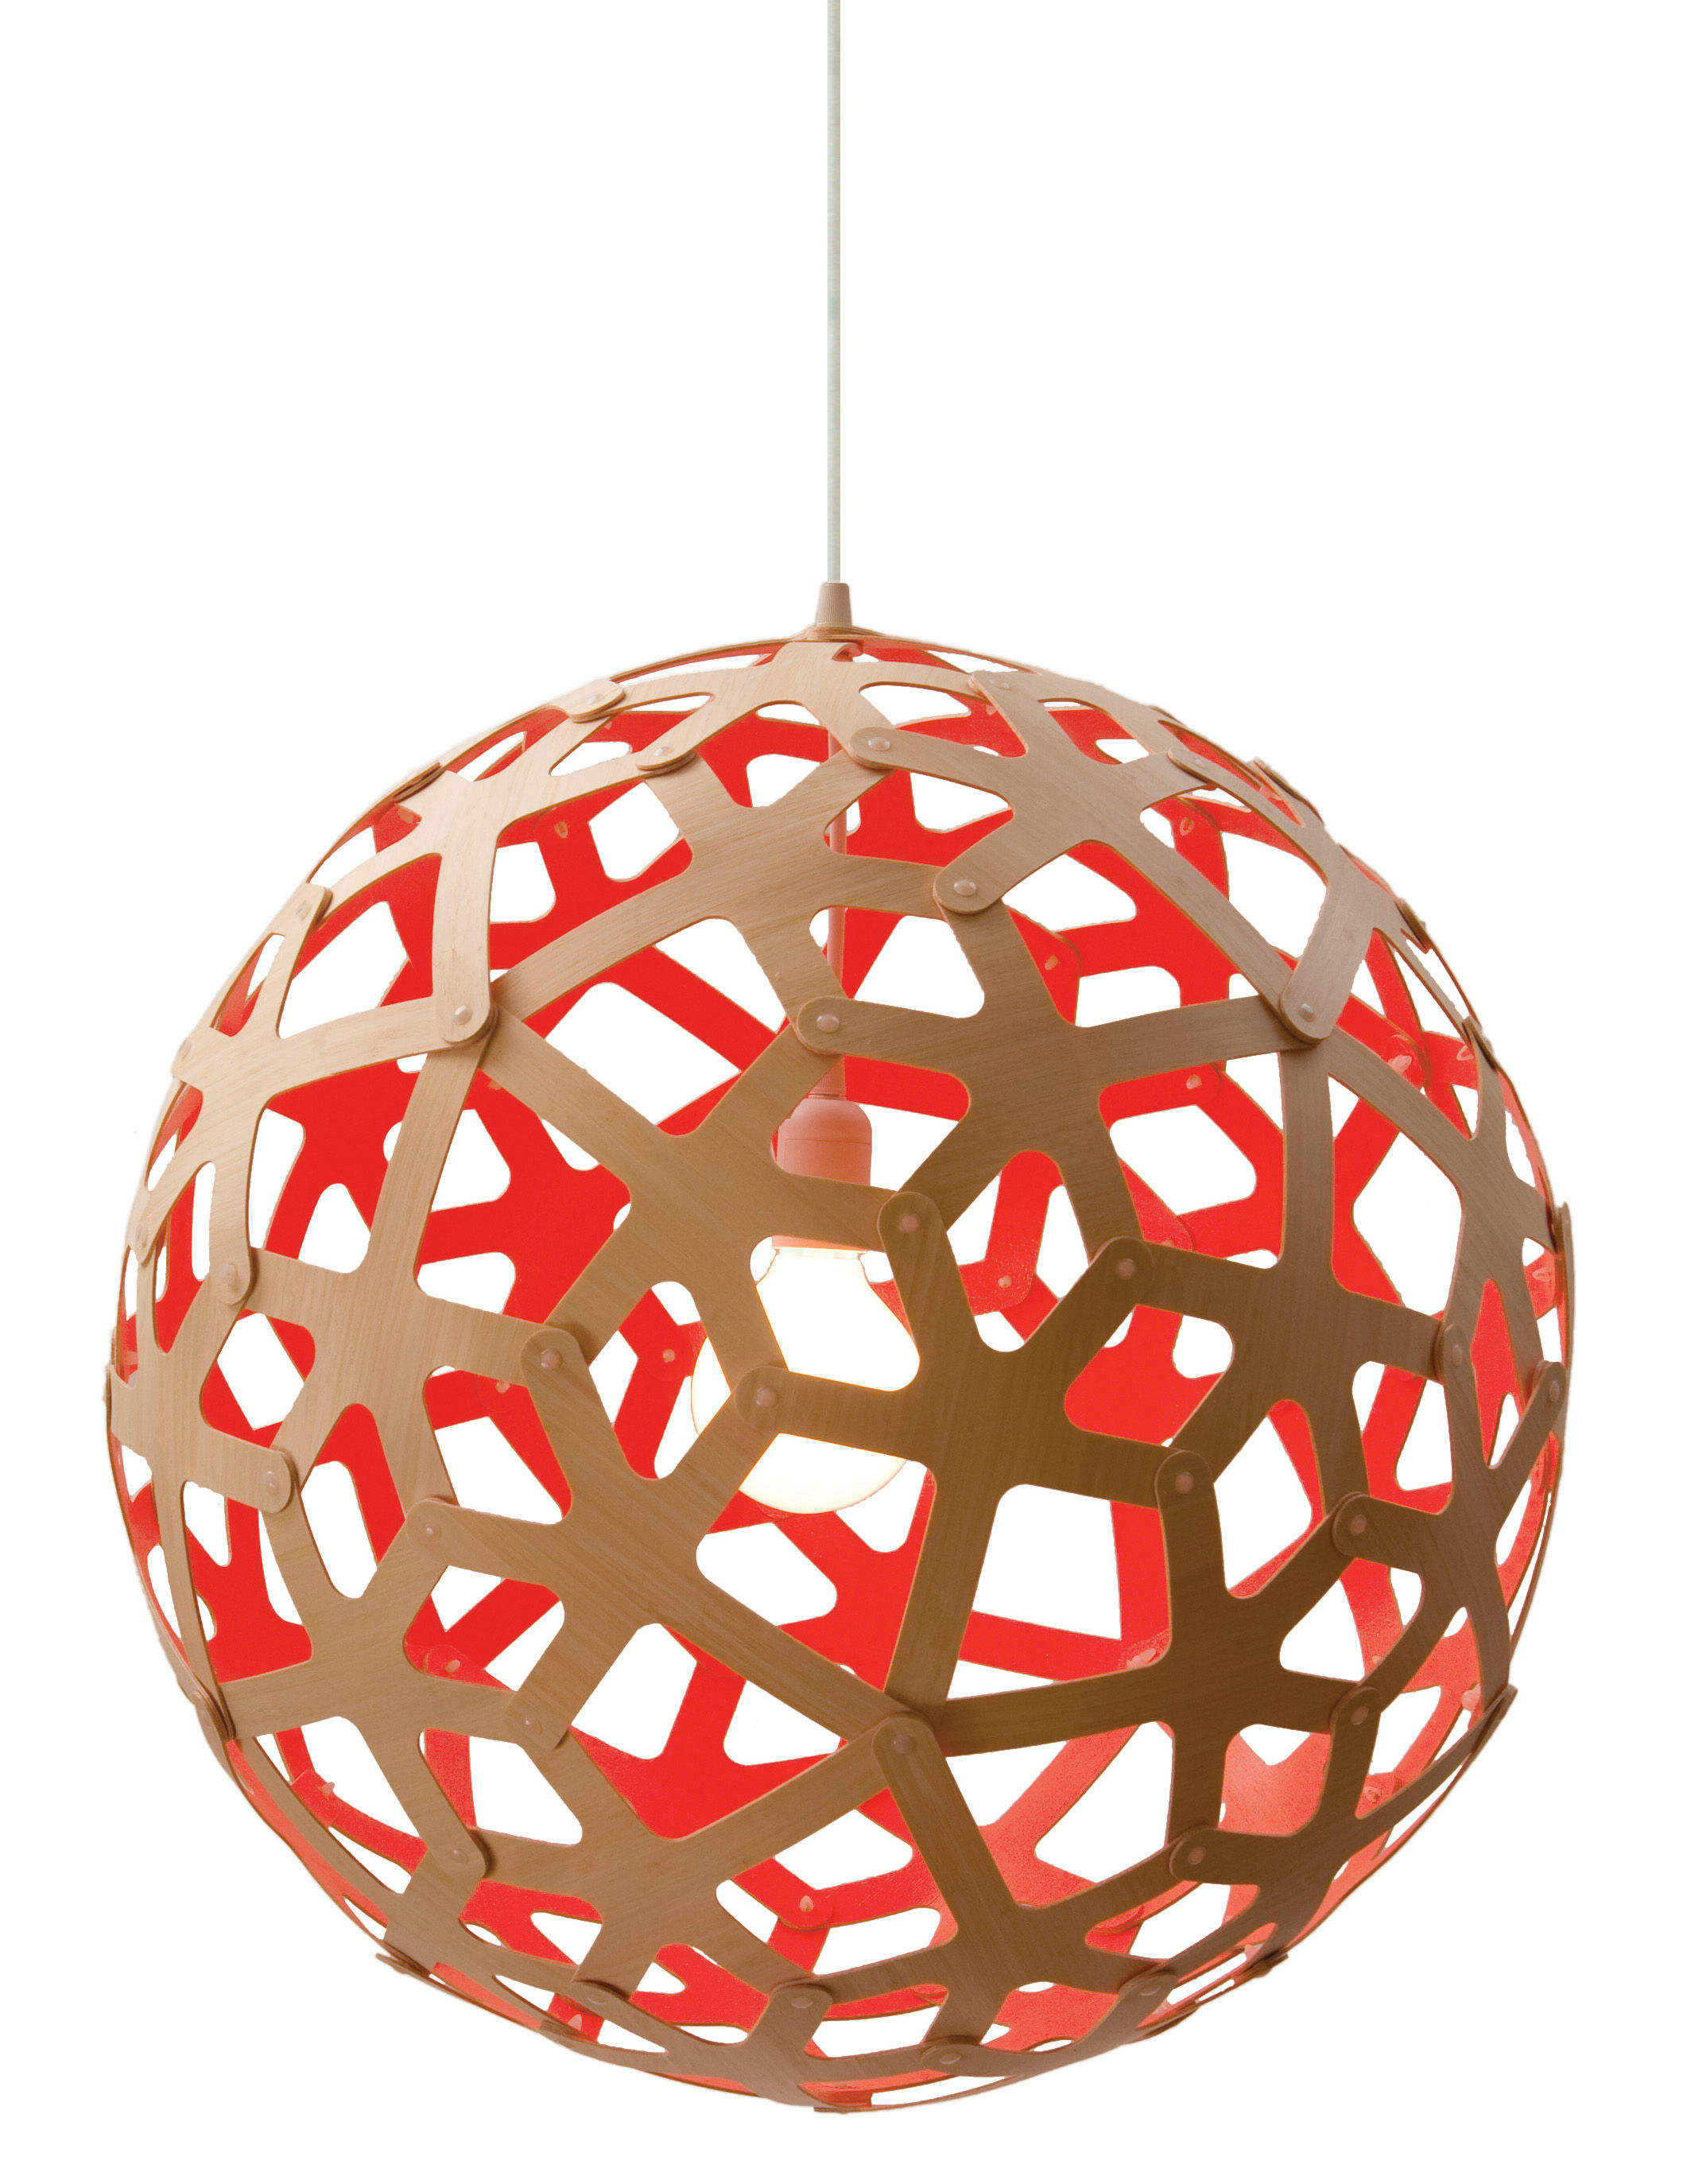 Lighting - Pendant Lighting - Coral Pendant - / Ø 40 cm - Bicoloured by David Trubridge - Red / Natural wood - Pine